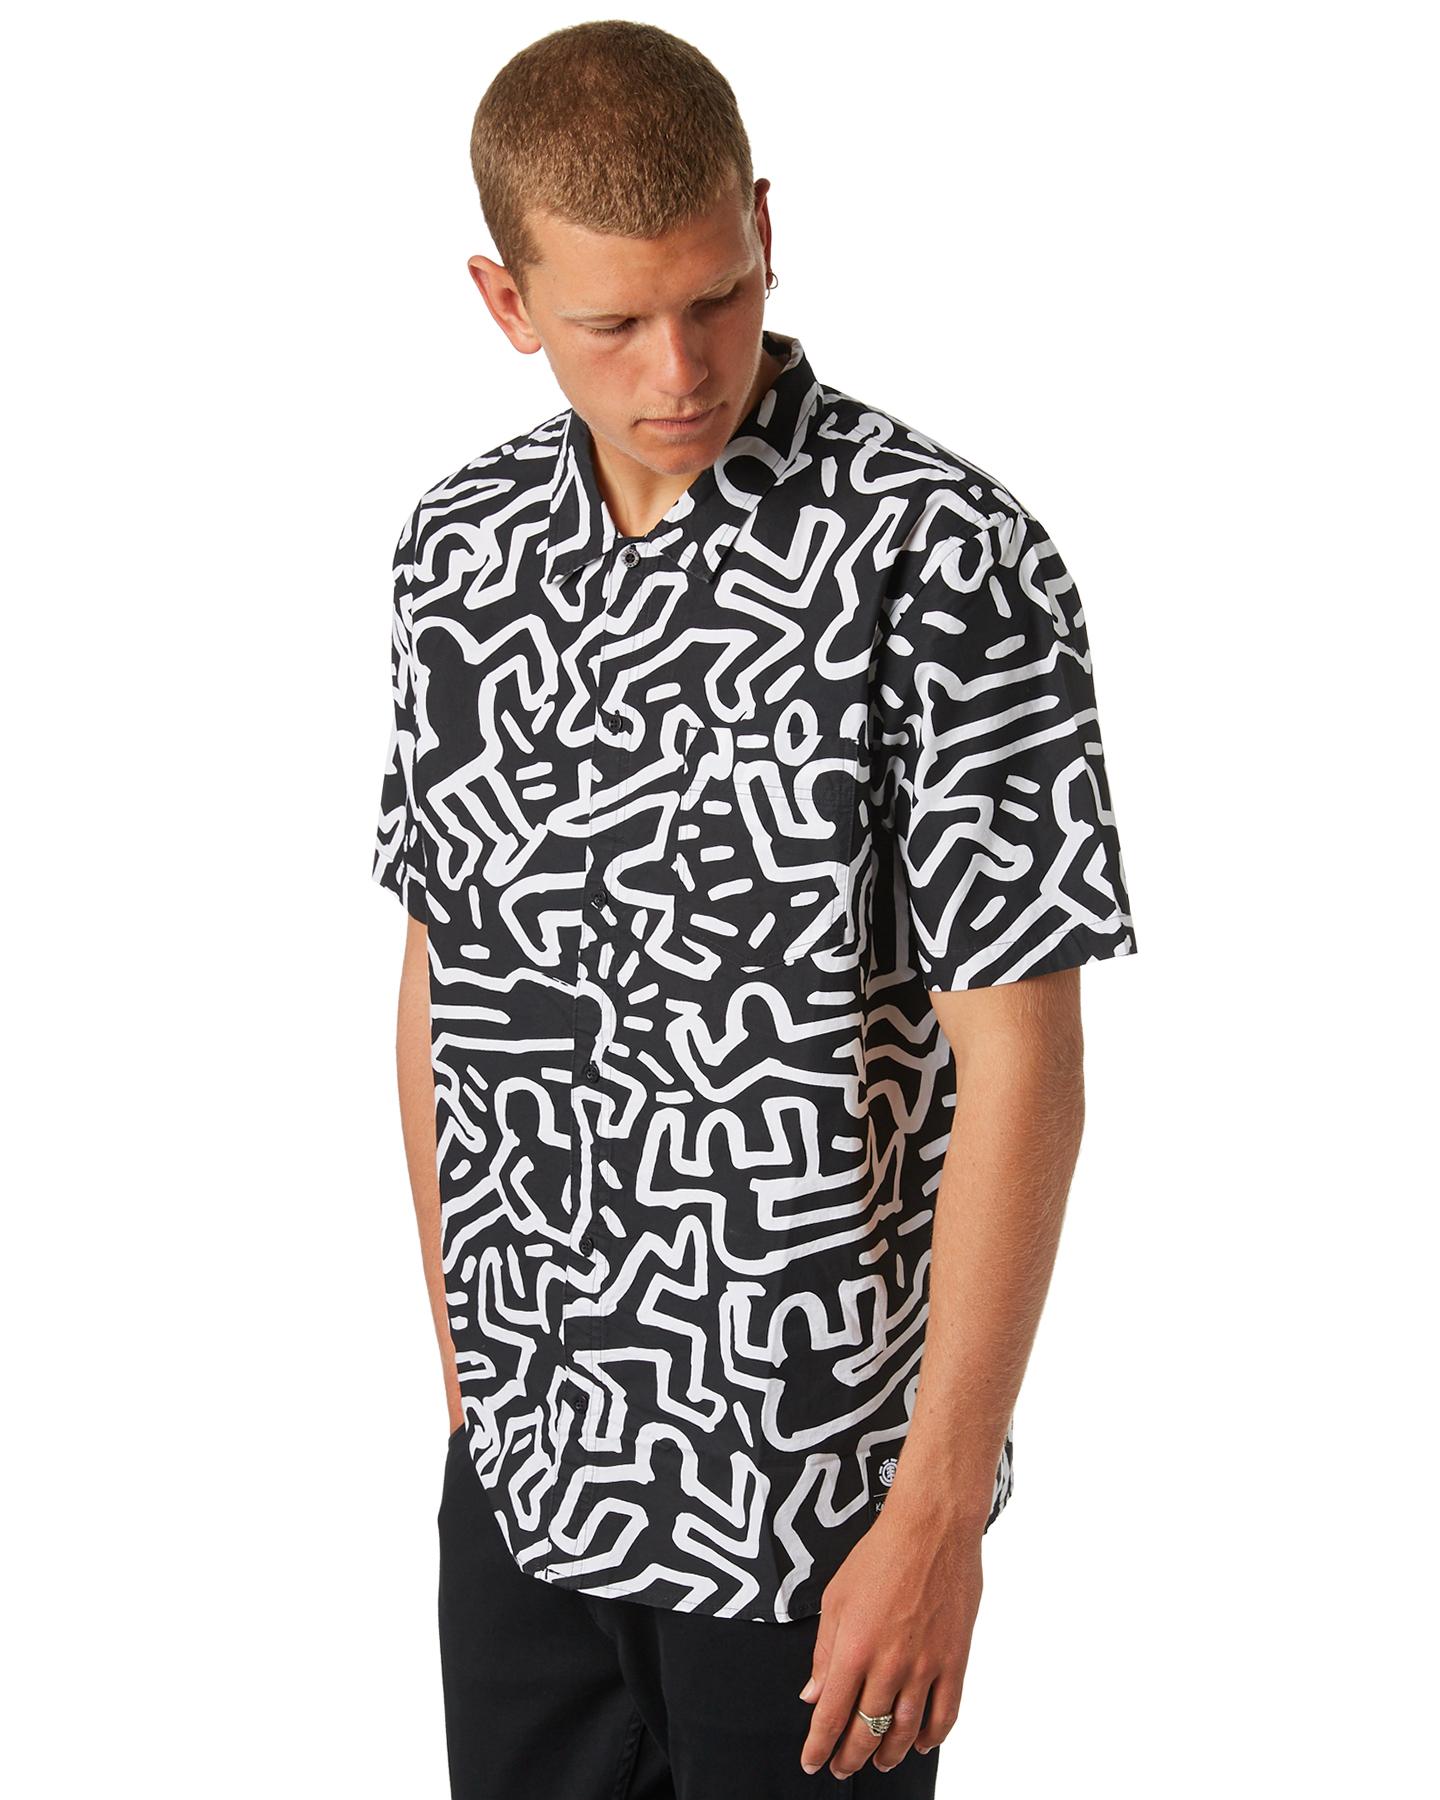 84f17b4b4 New Element Men's Keith Haring Ss Mens Shirt Short Sleeve Cotton ...